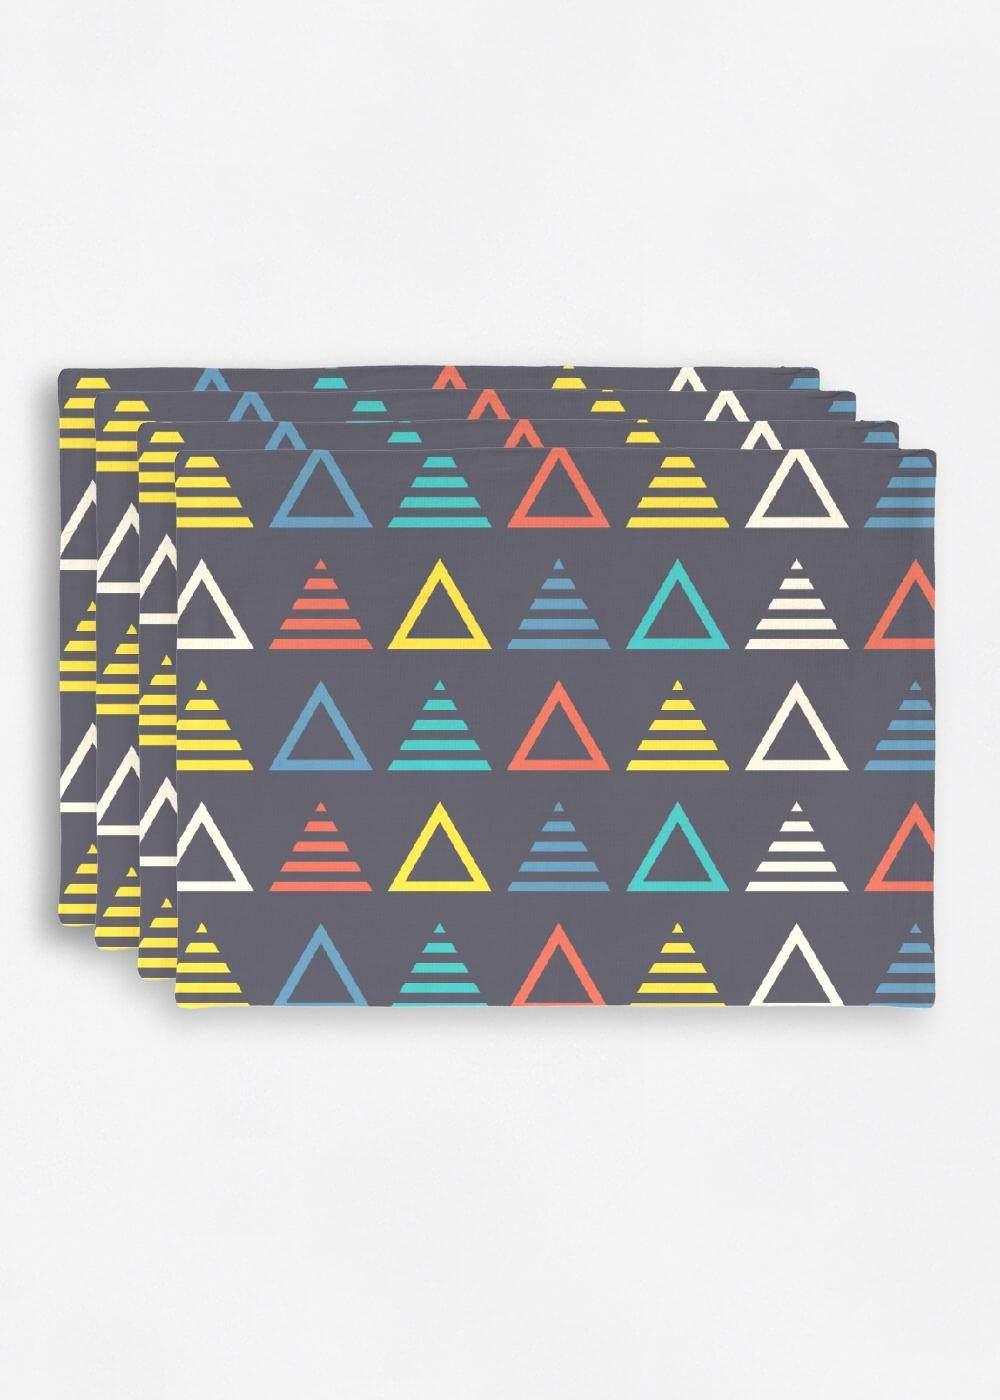 VIDA Placemat Set - Music Symmetric Triangle by VIDA Original Artist  - Size: Set of 4